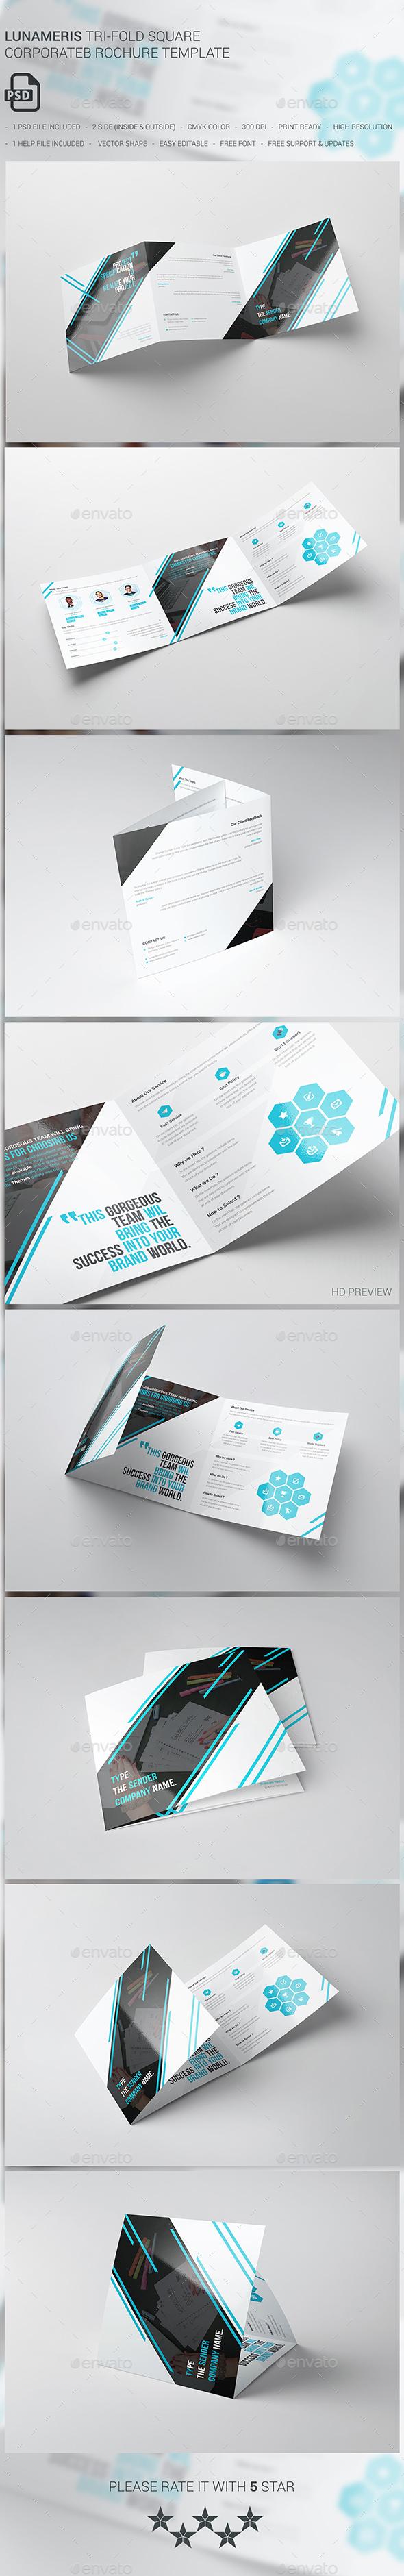 Lunameris Square Tri-fold Brochure Template - Brochures Print Templates